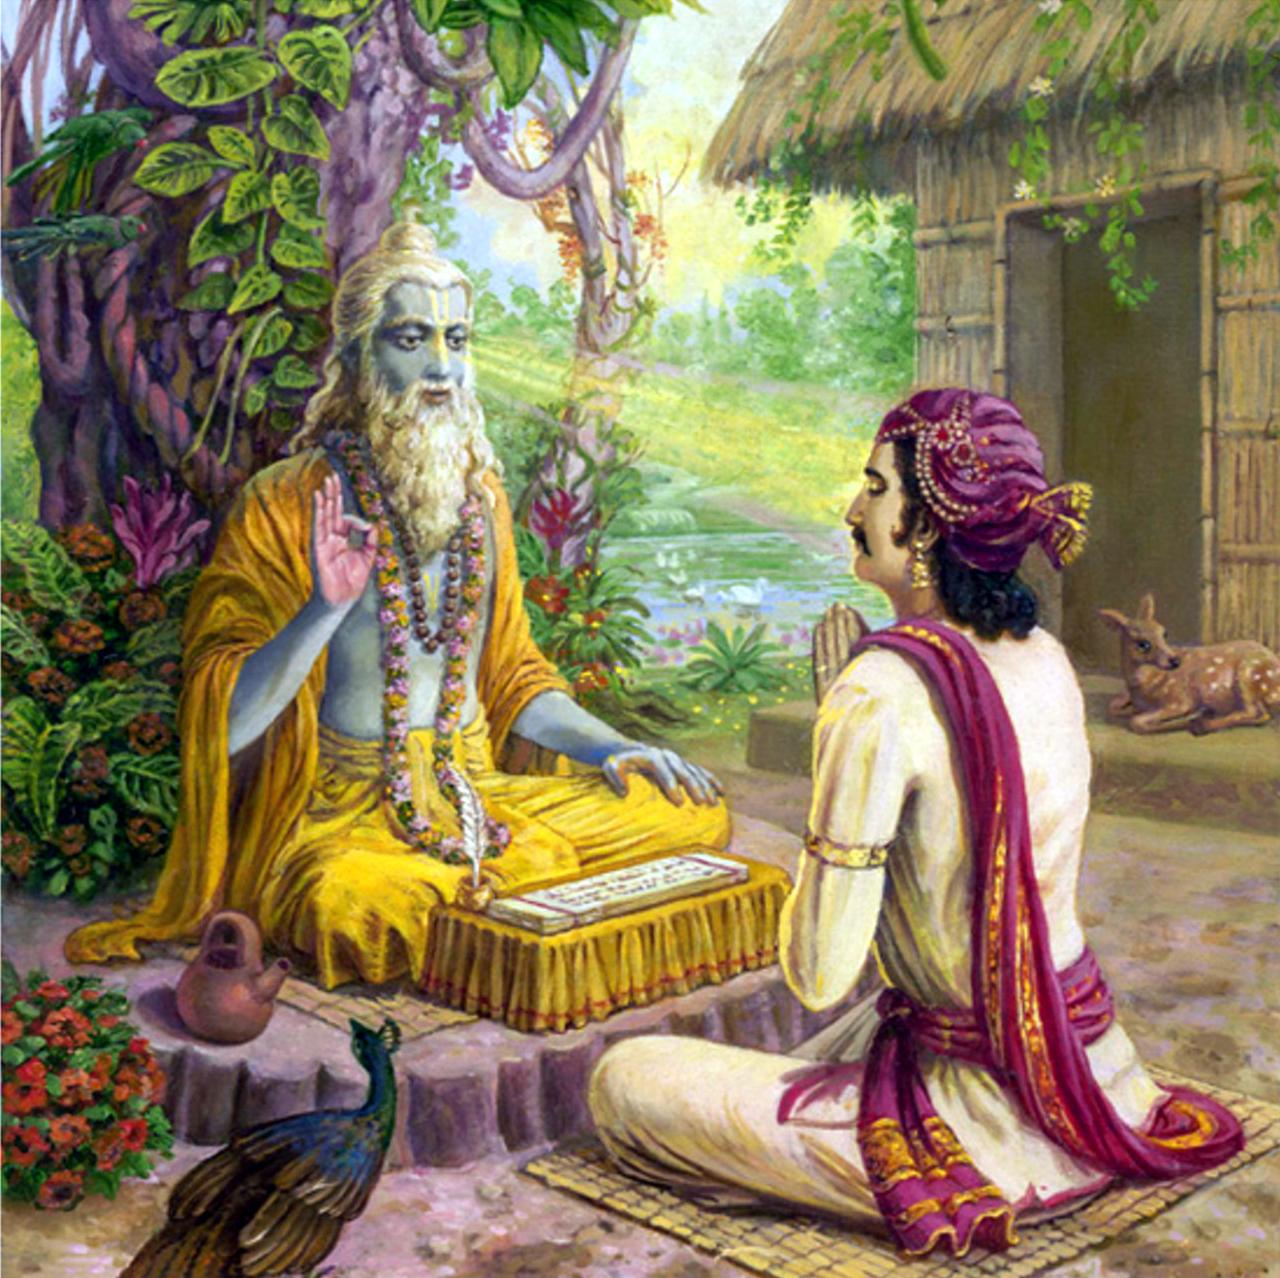 Мудрец - риши благословляет царя